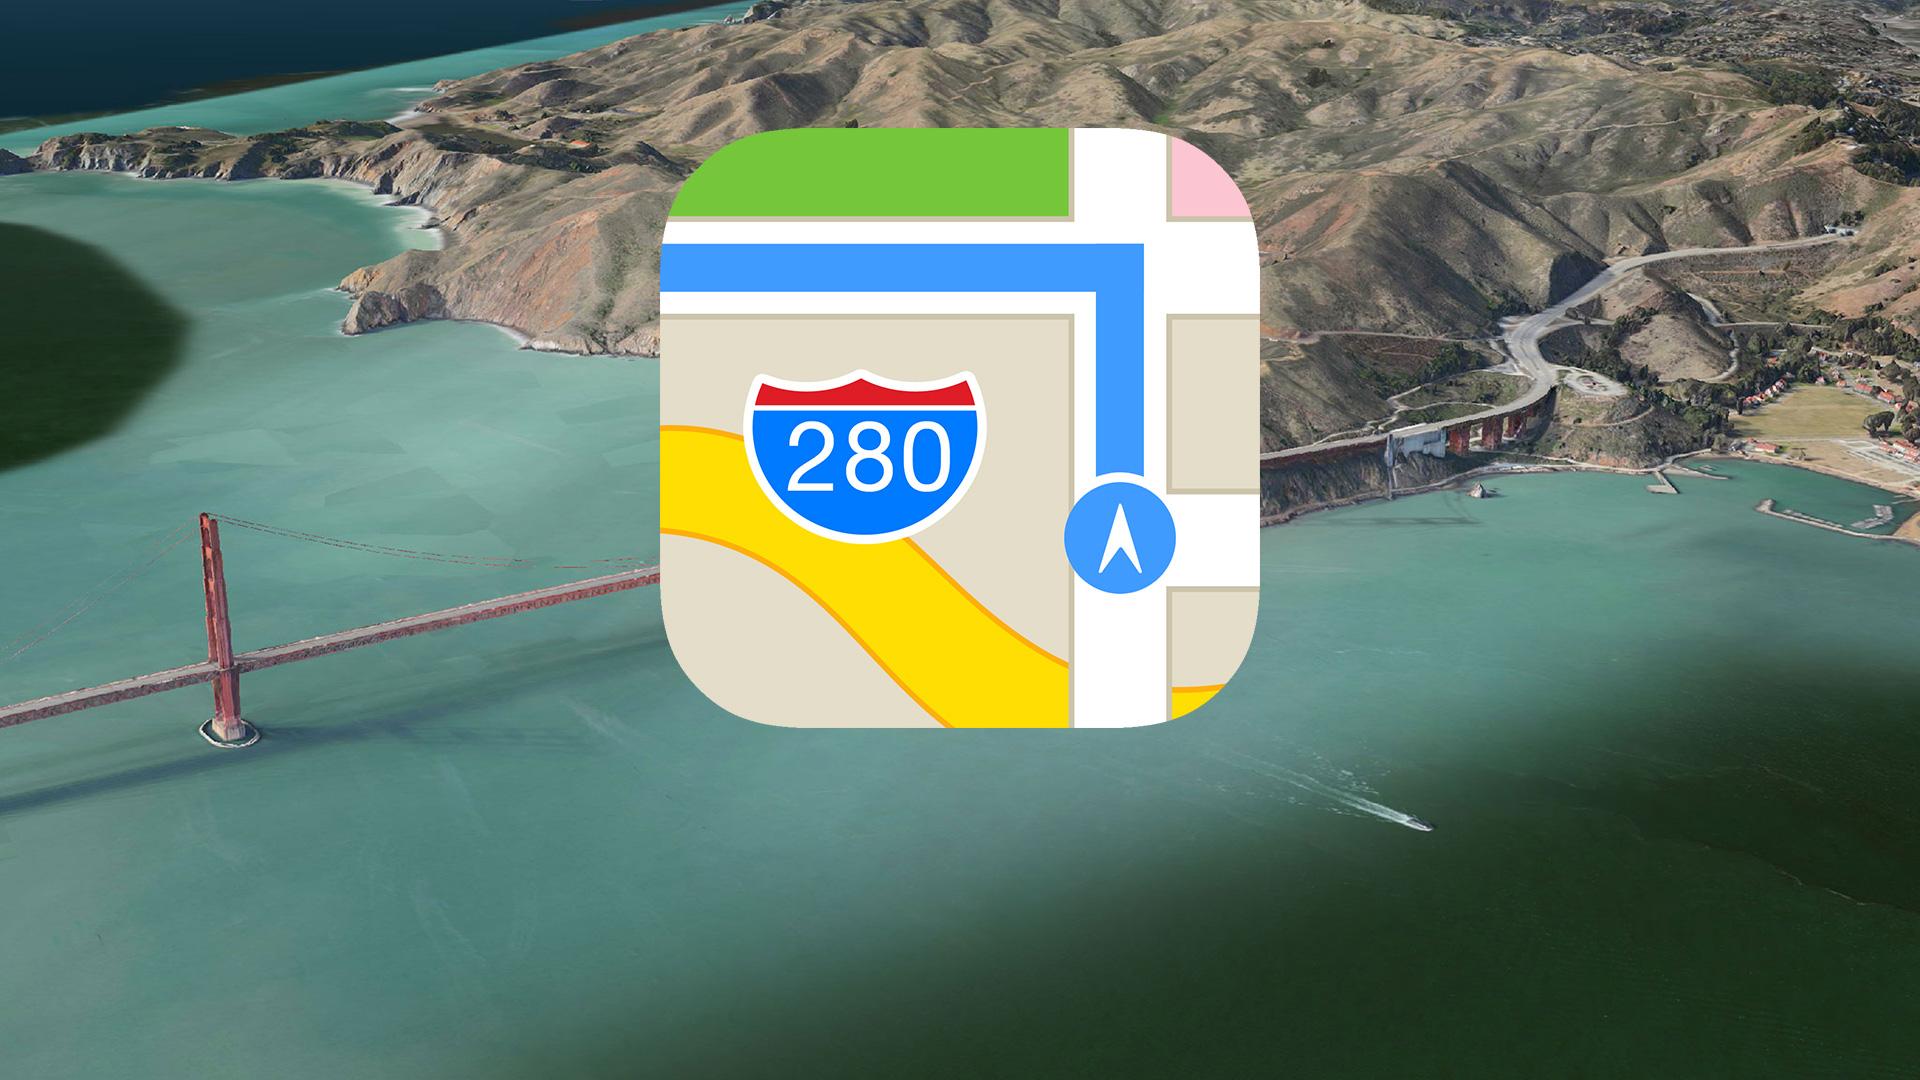 Кто и на каких условиях работает над Apple Maps